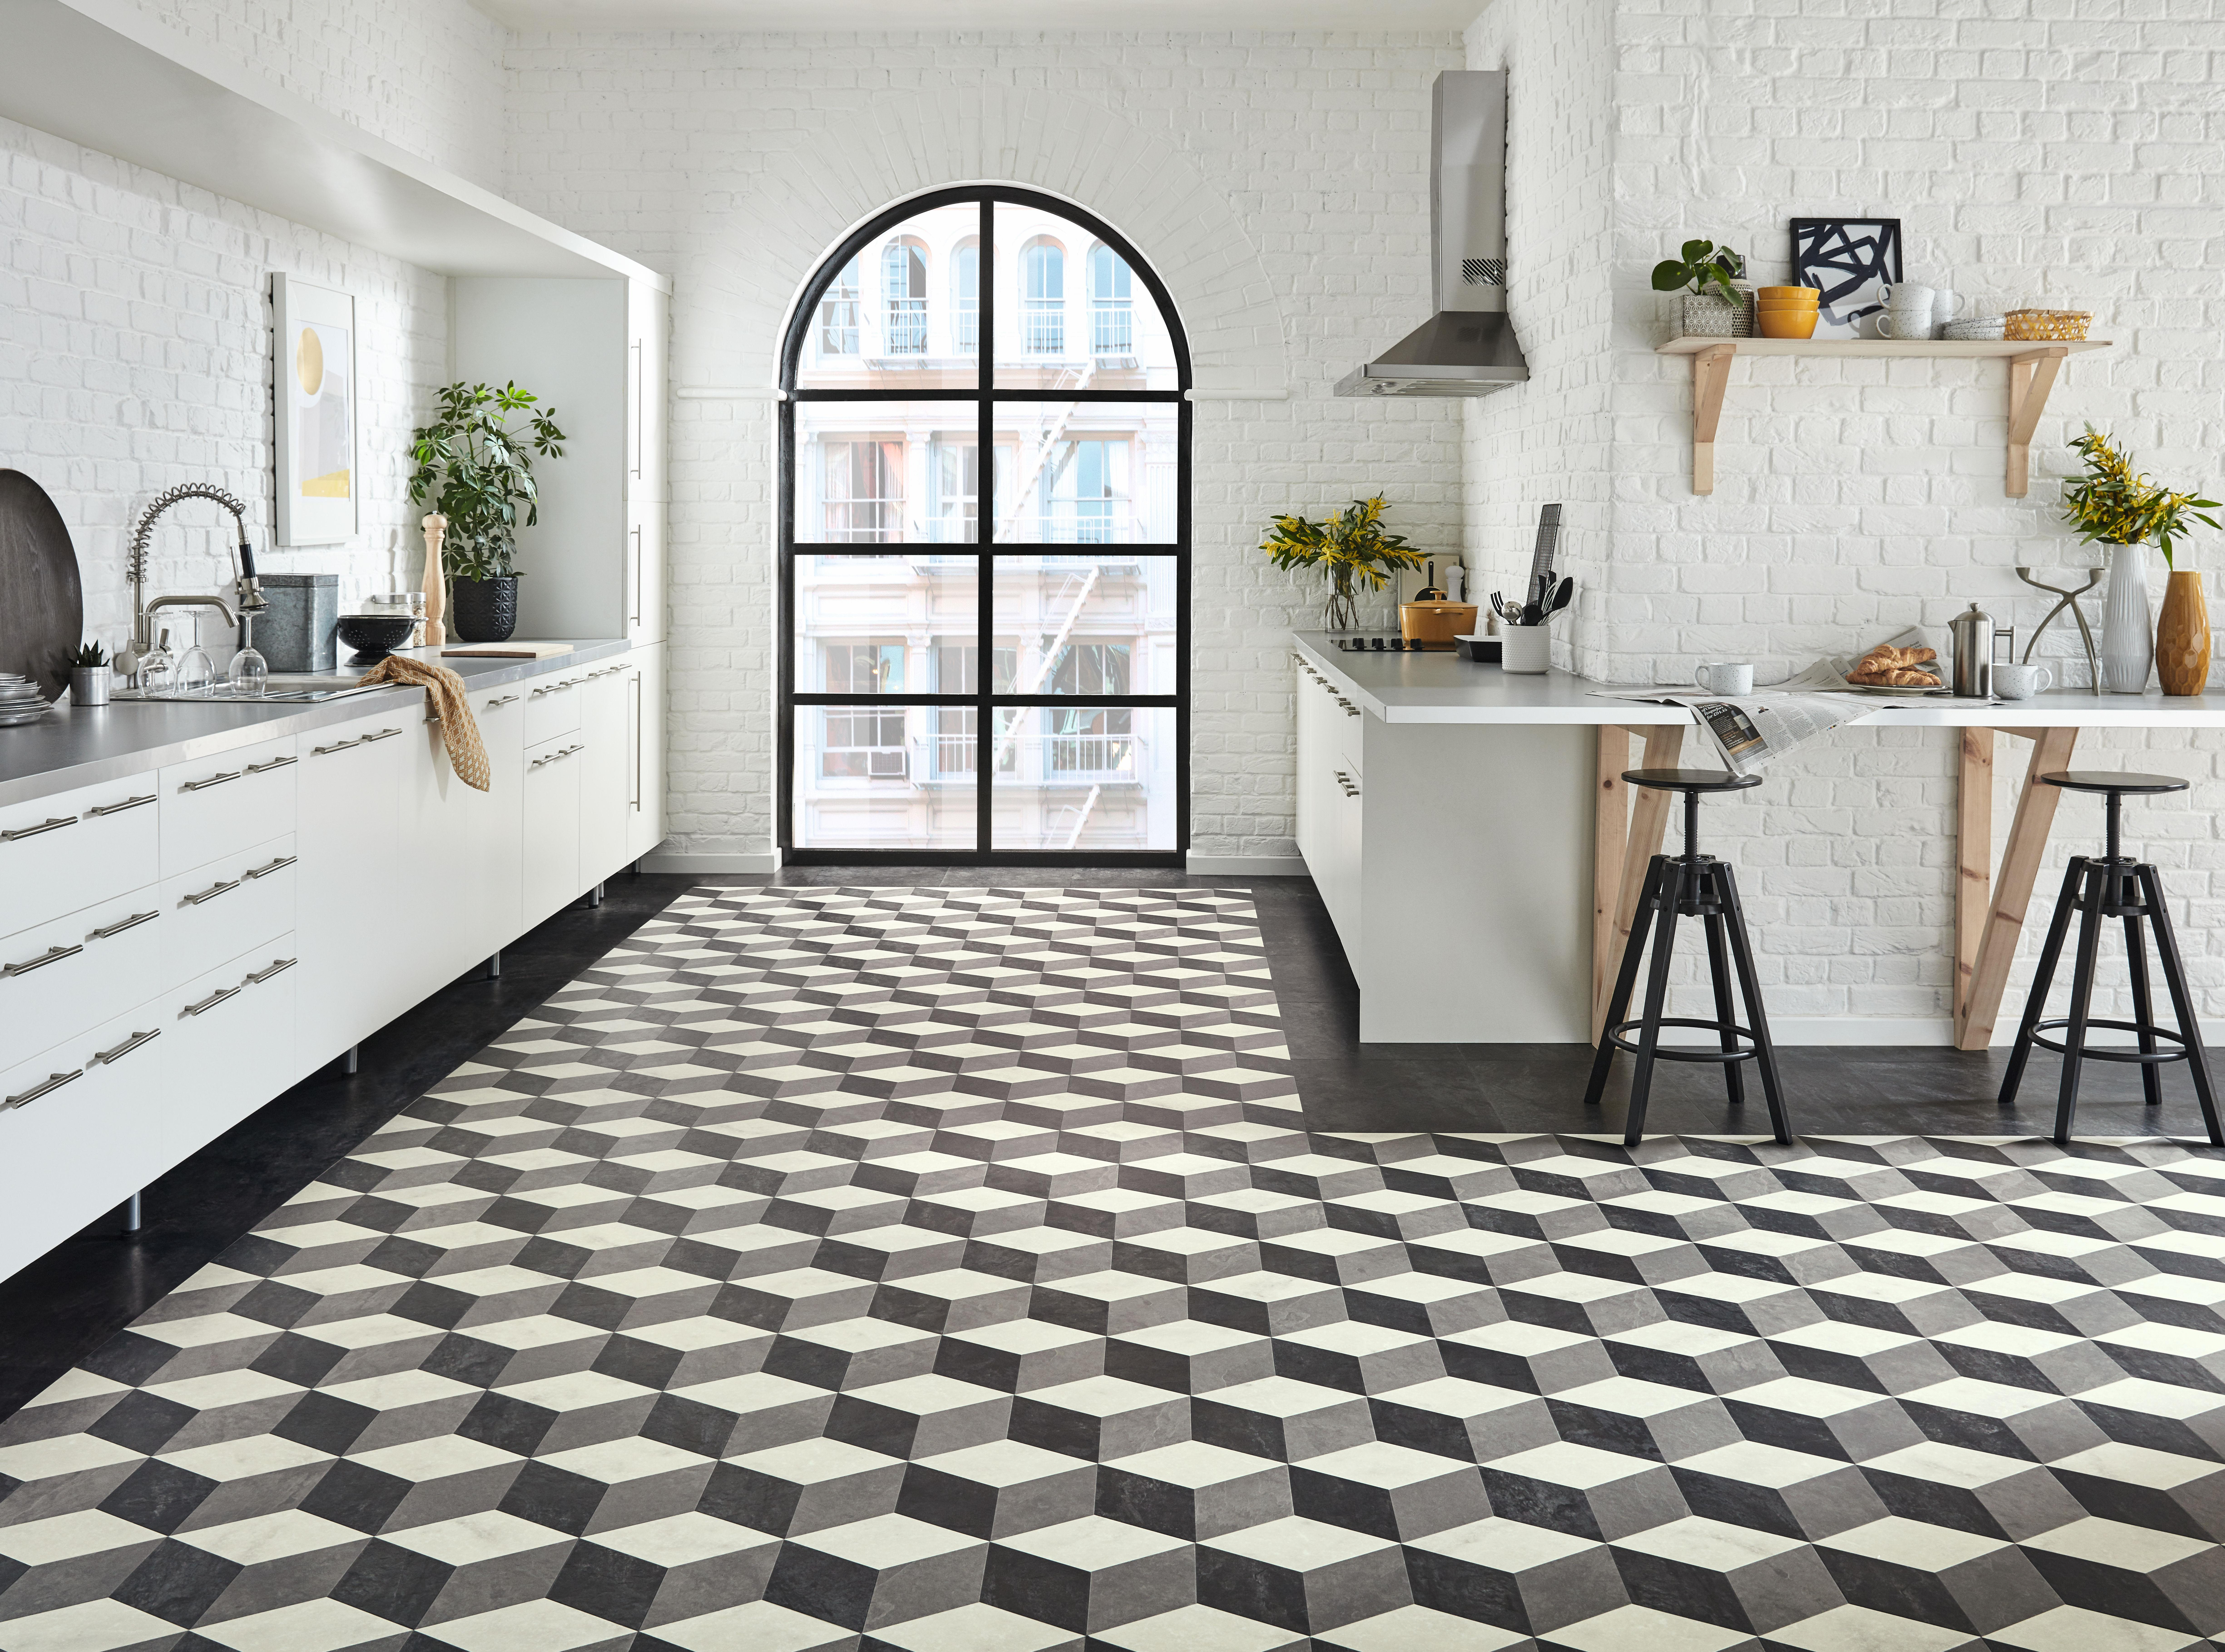 Tiles, laminate or luxury vinyl: Which kitchen flooring option\'s ...